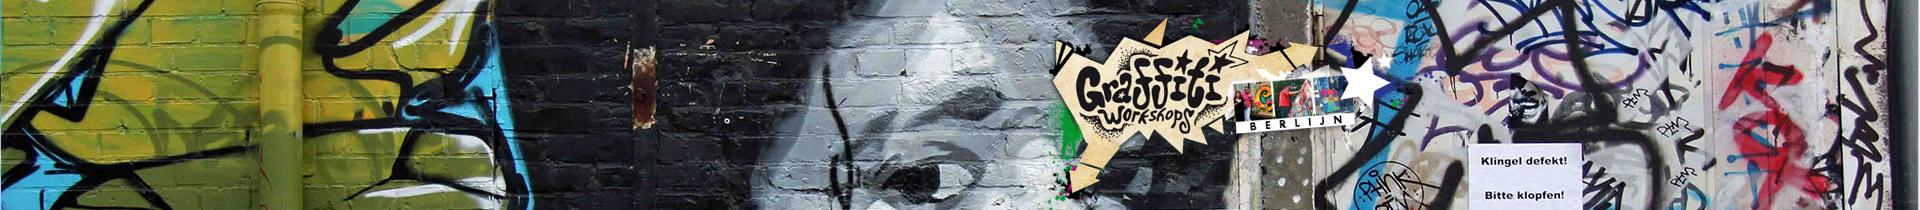 https://www.graffitiworkshopsberlijn.nl/wp-content/uploads/2015/05/graffiti-in-berlijn.jpg